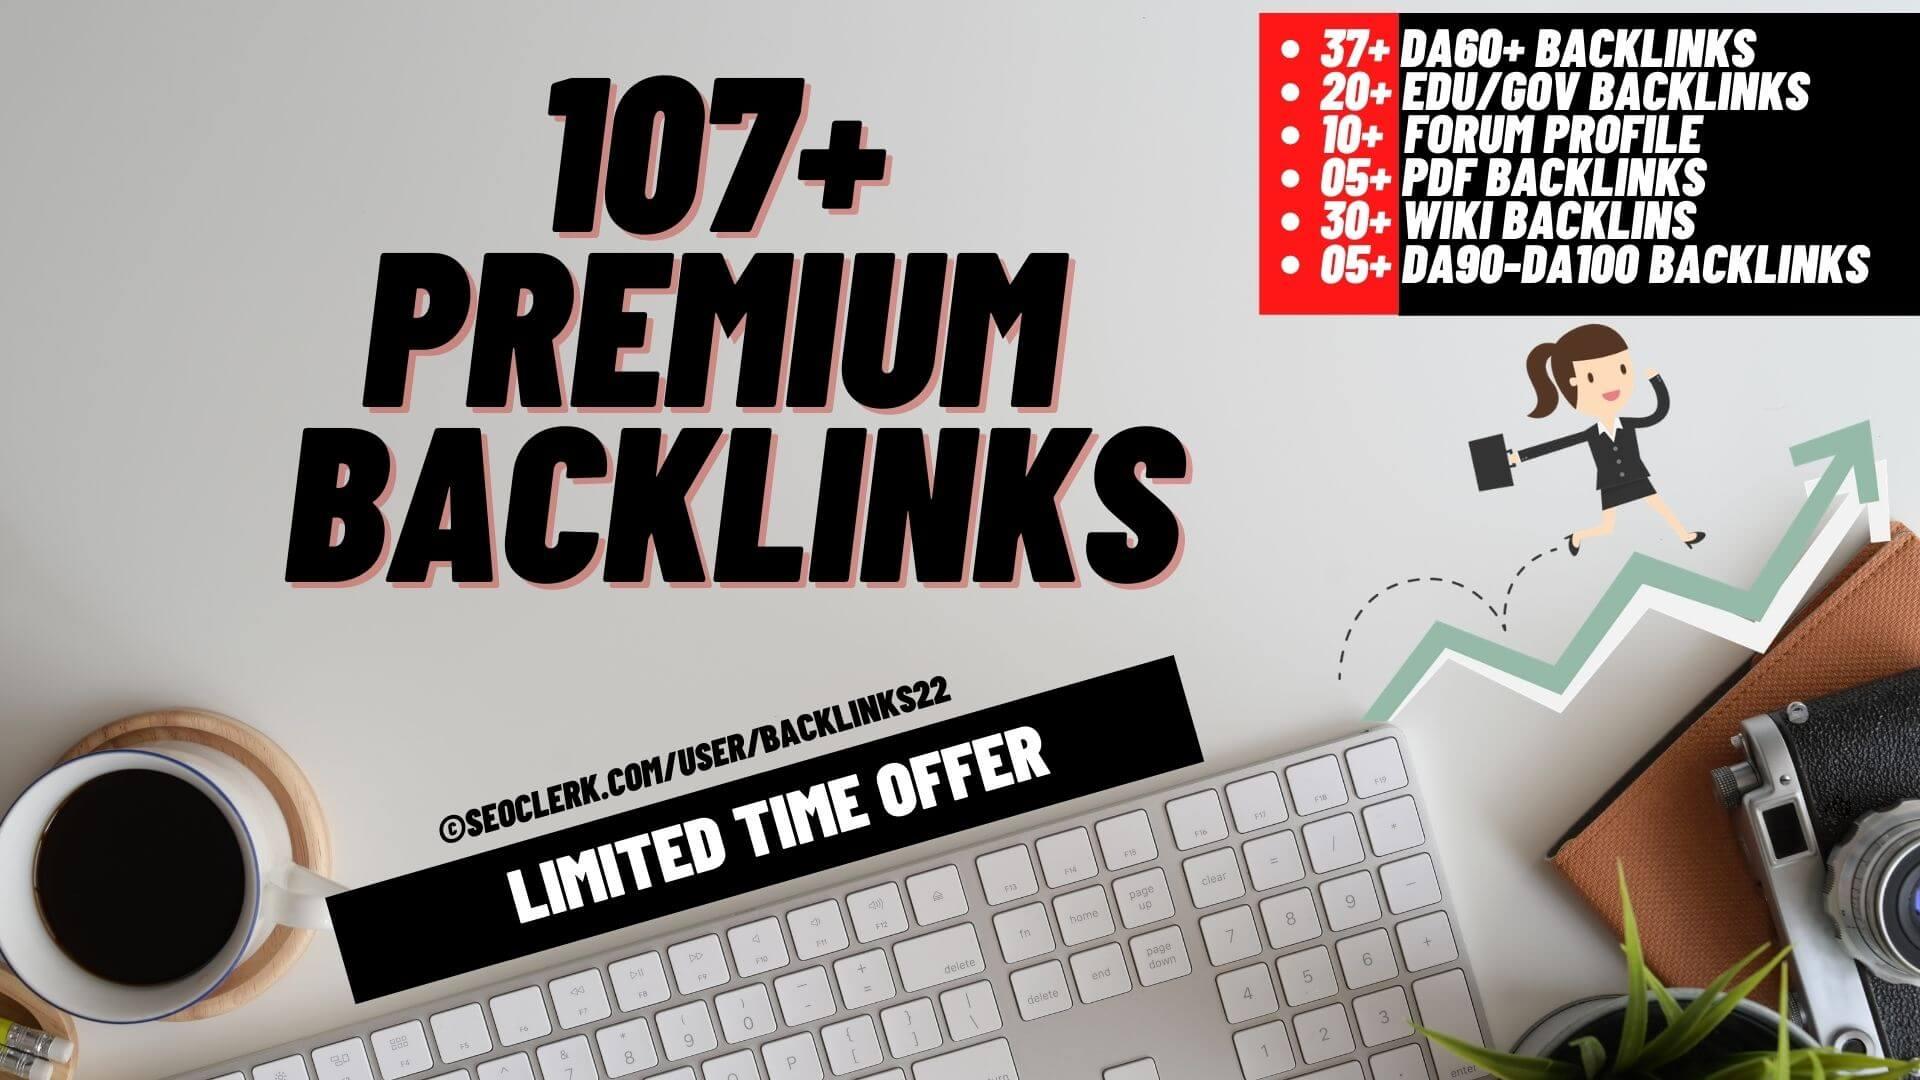 DA90+ Backlinks - 20 Edu/Gov,  30 Wiki,  10 Forum,  05 PDF,  37 DA60+ and 05 from DA90+